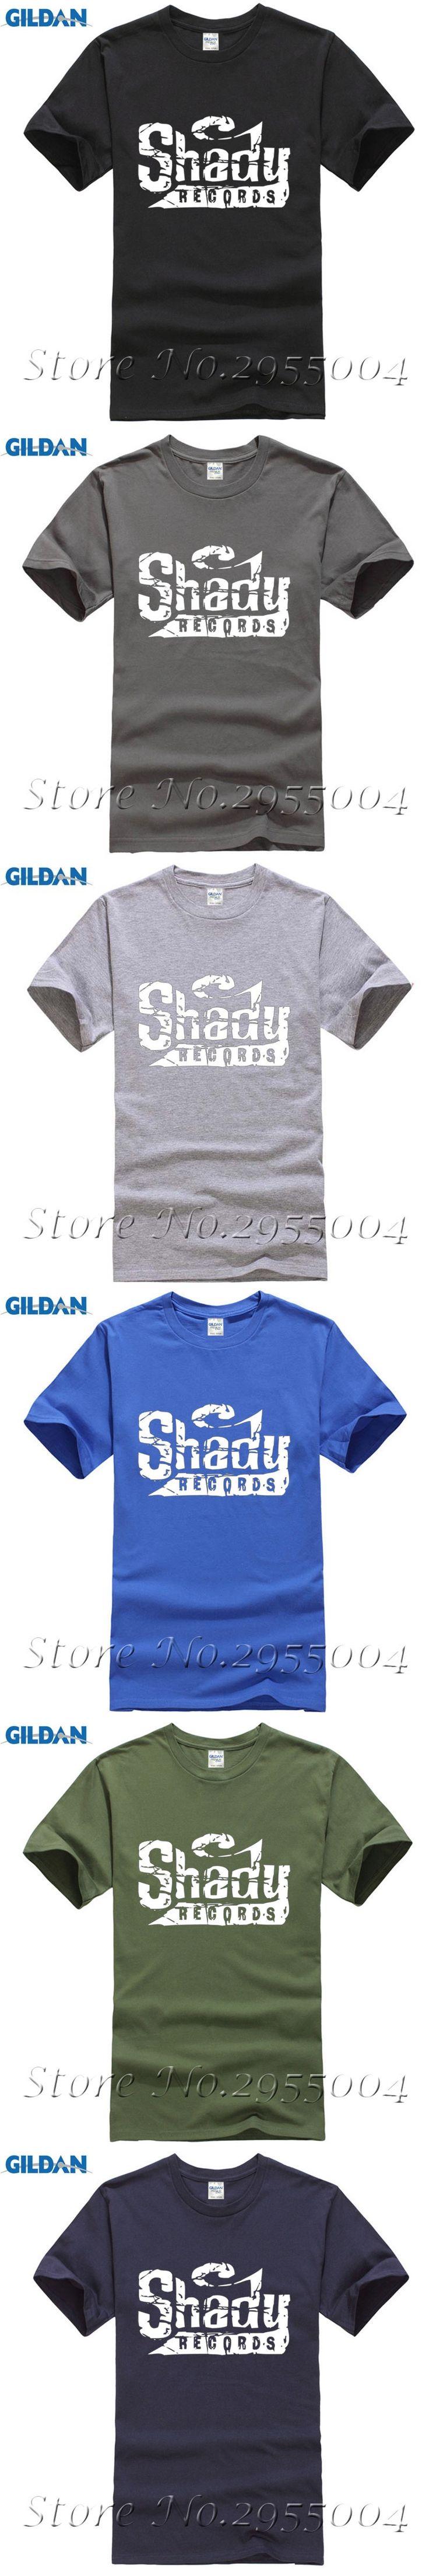 The Greatest Rapper T-Shirt Authentic Eminem Shady Records Top Tee Shirt Oneck Big Yard Rap Music Tshirt Punk Rock Free Shipping